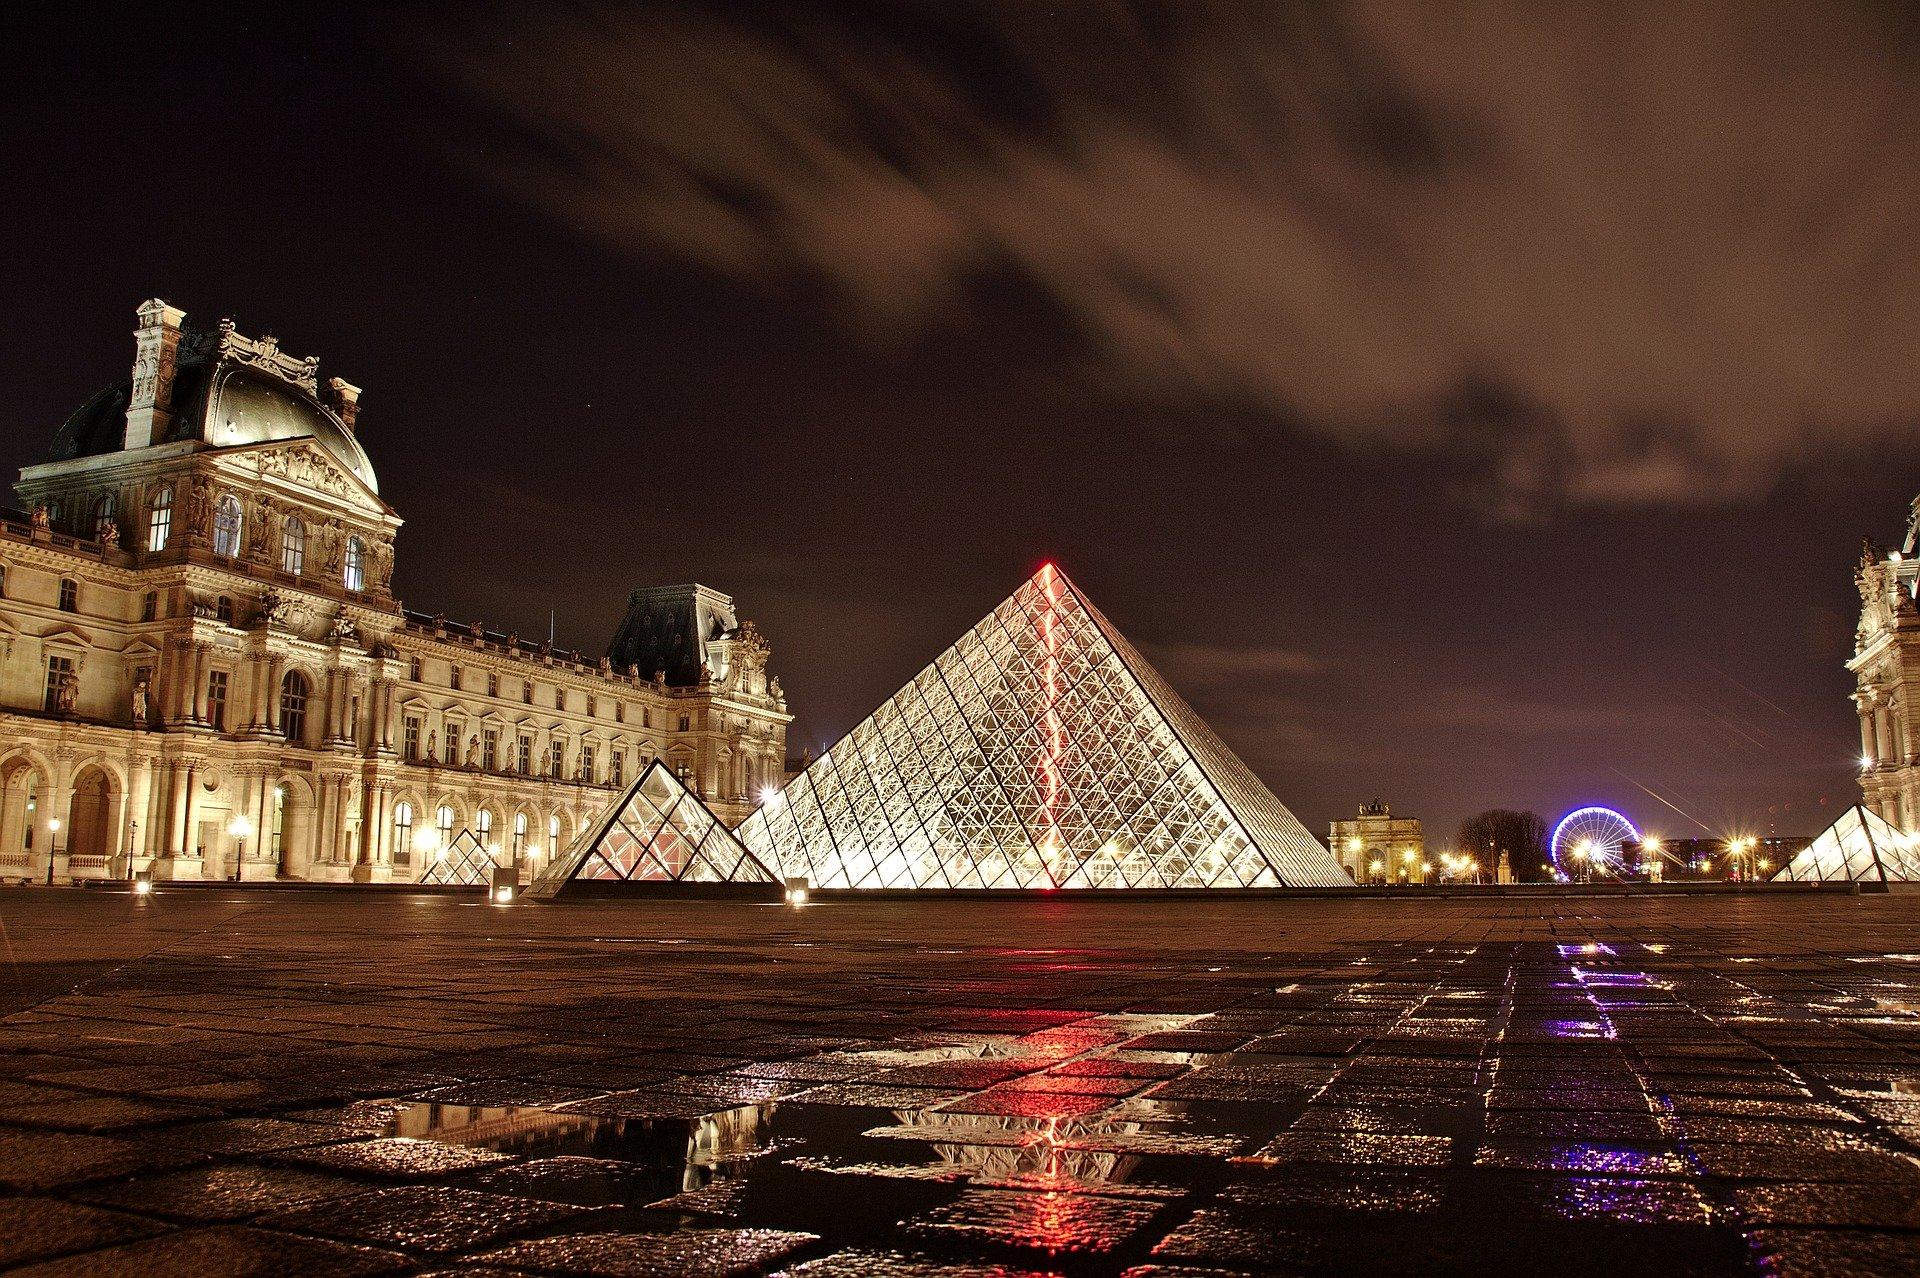 kmt-paris-travel-inspirations-